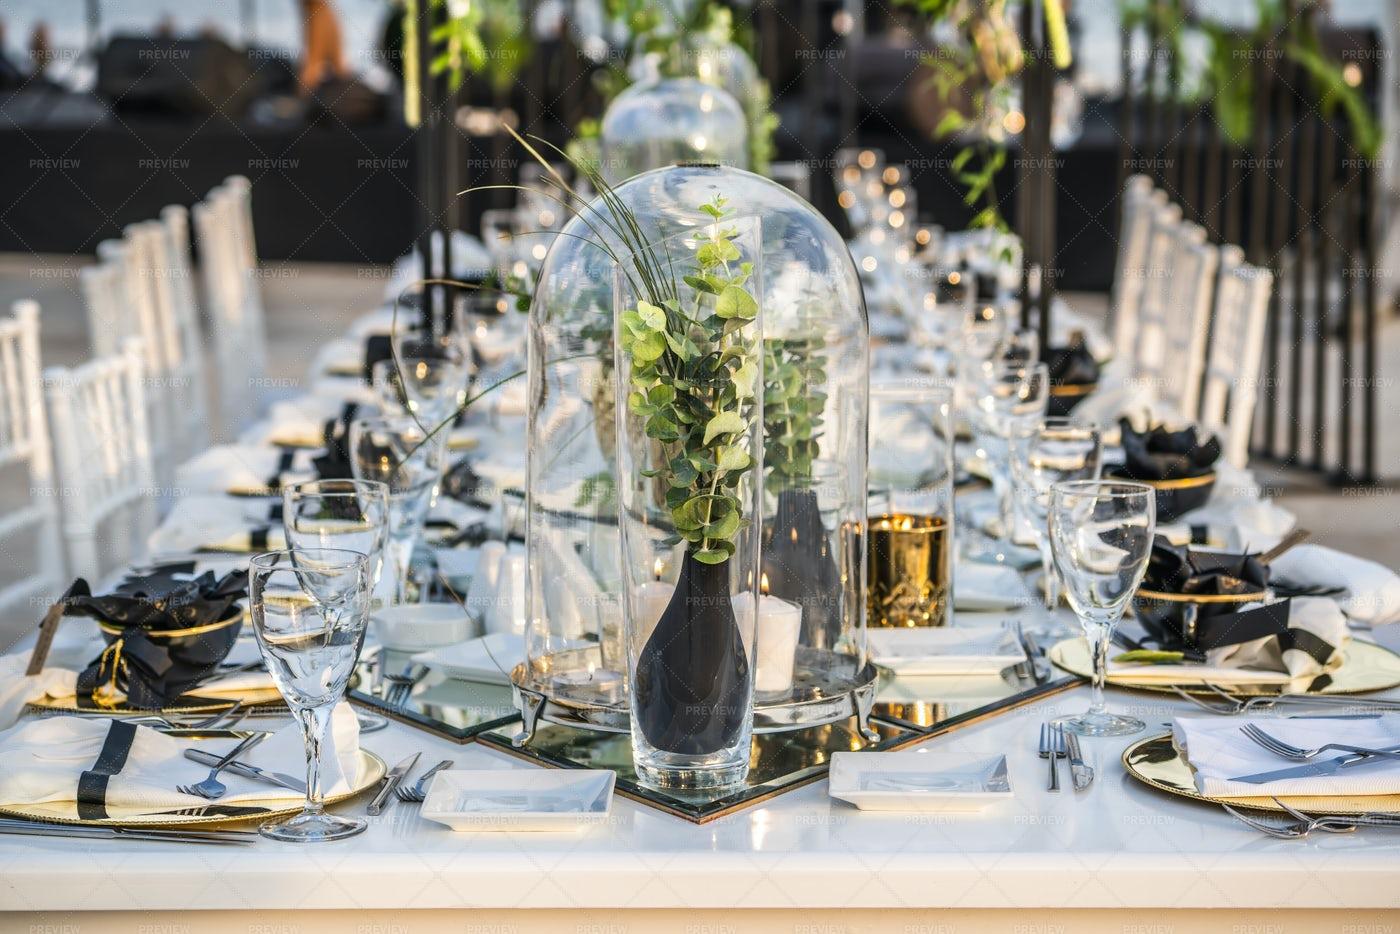 Laid Wedding Table: Stock Photos